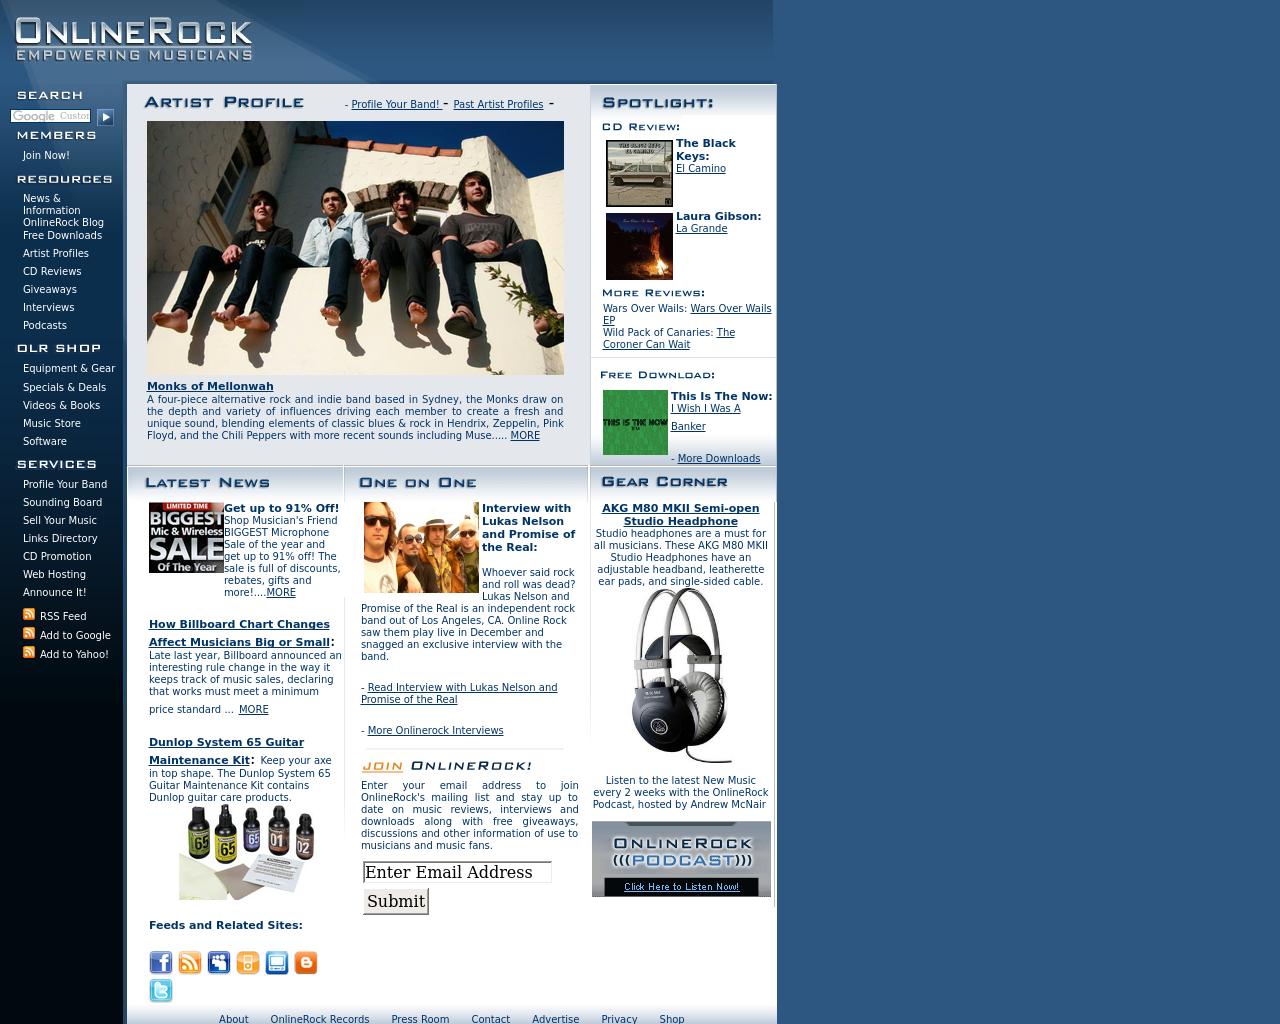 OnlineRock-Advertising-Reviews-Pricing